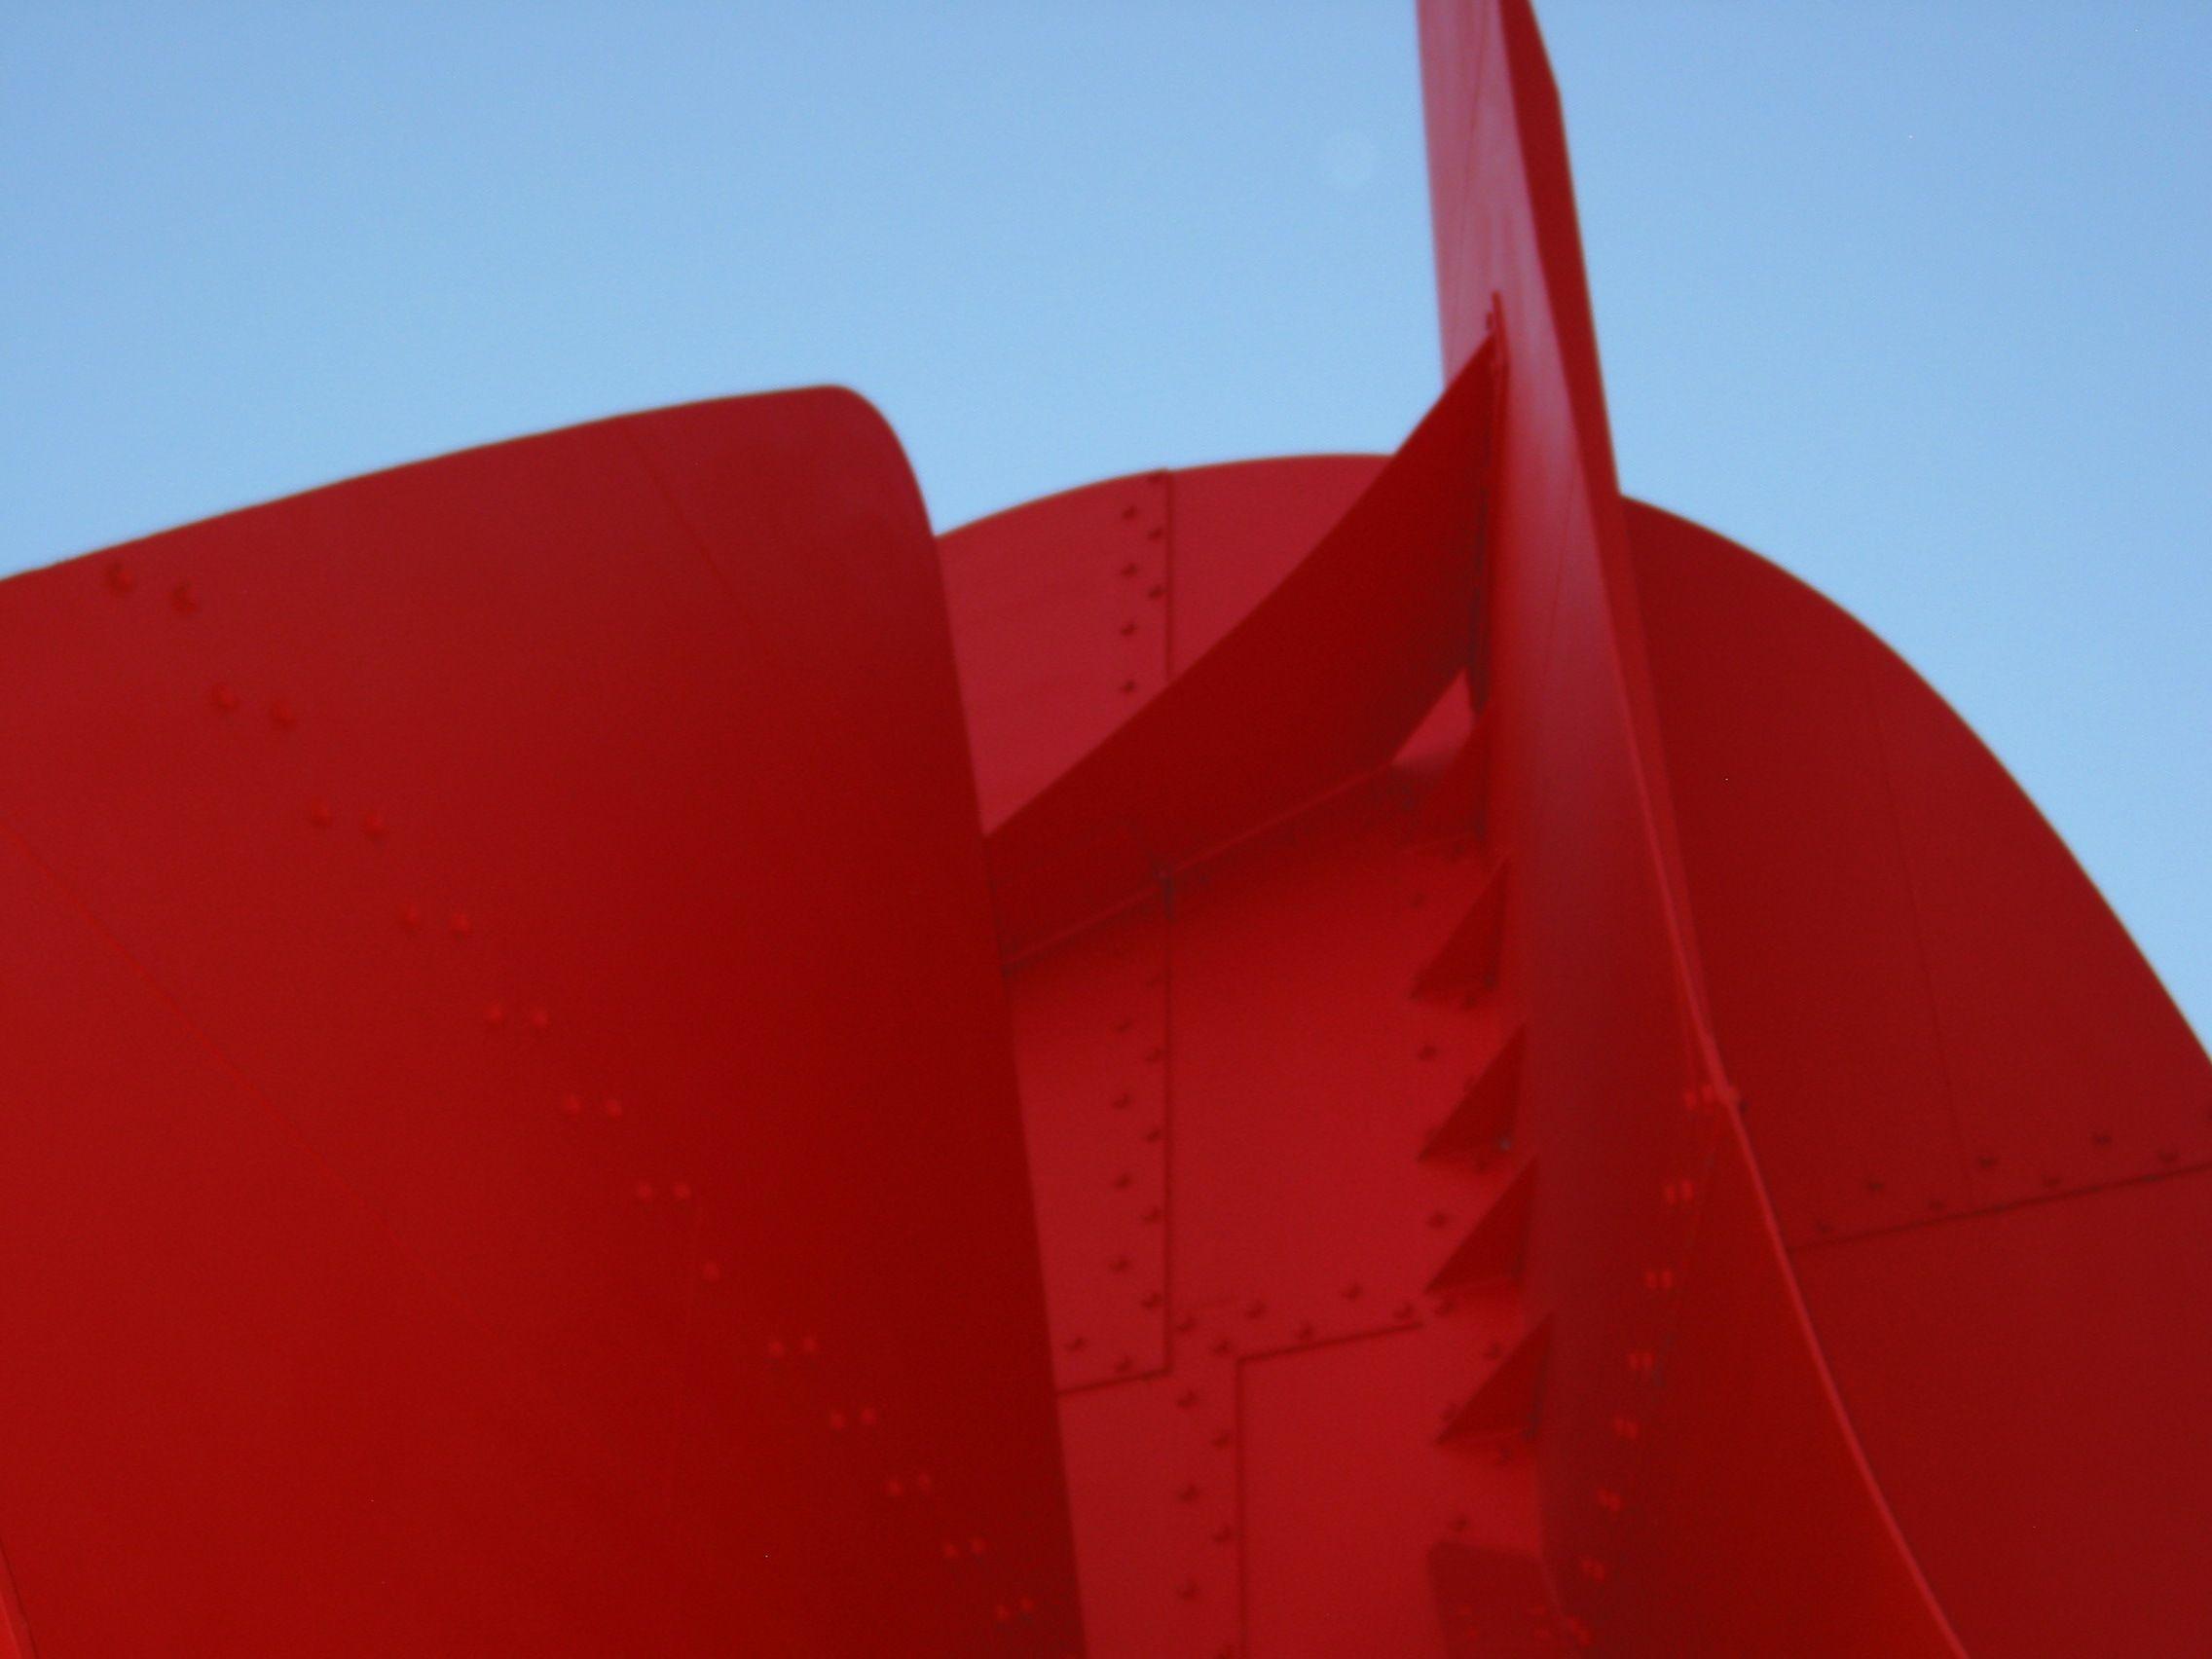 La Grande Vitesse Alexander Calder Grand Rapids Mi Con Imagenes